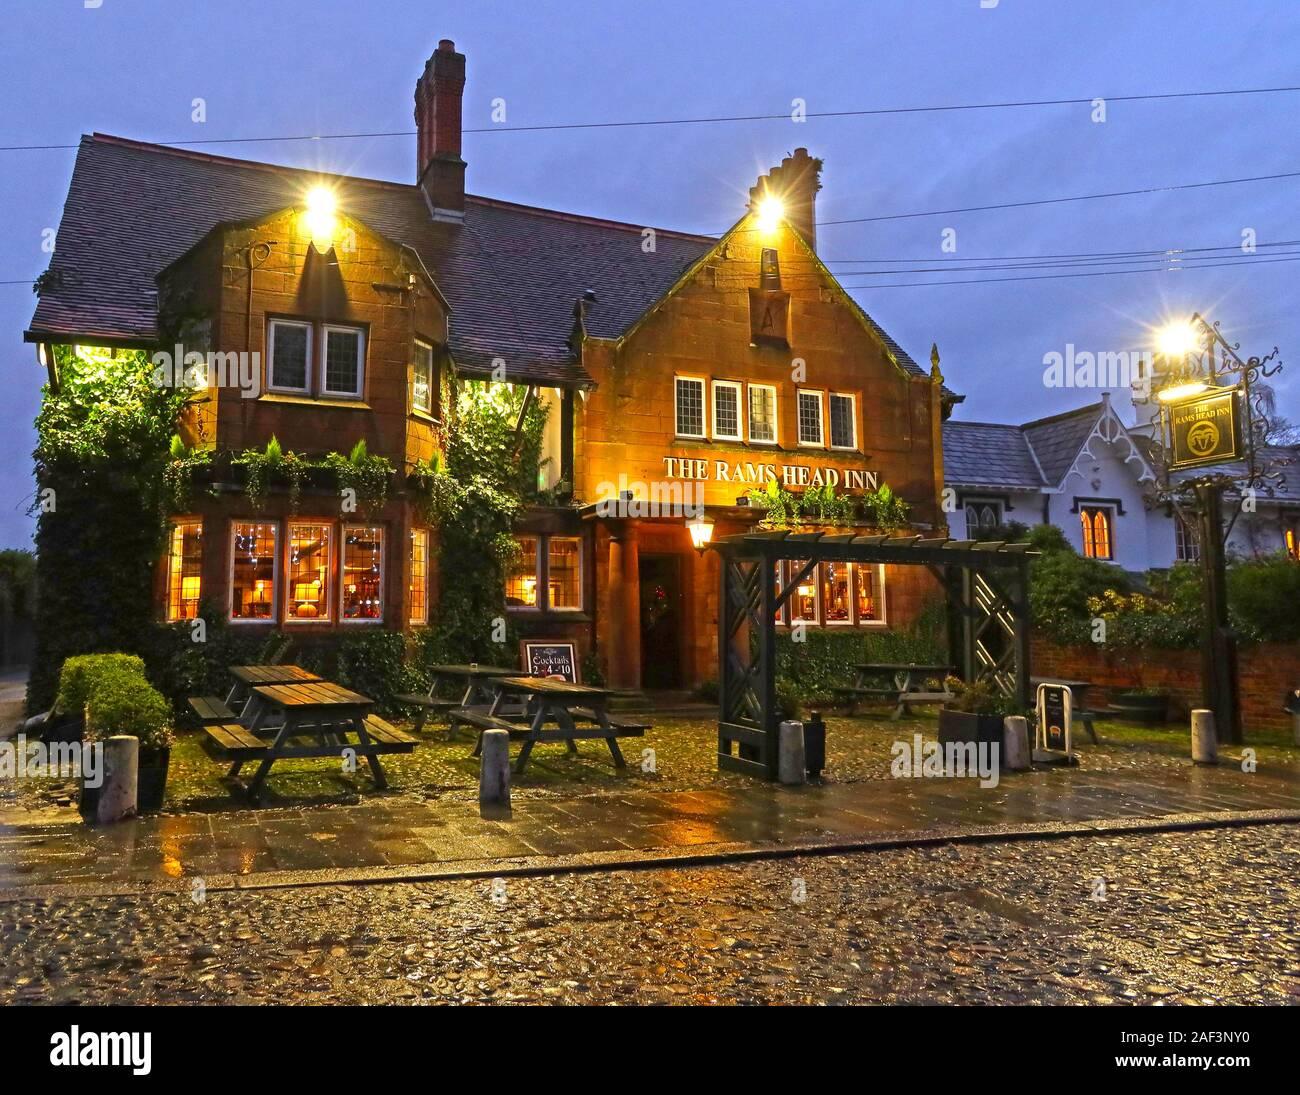 Dieses Stockfoto: Rams Head Pub, gepflasterte Church Lane, Grappenhall, Warrington, Cheshire, England, UK, WA4 3EP, - 2AF3NY